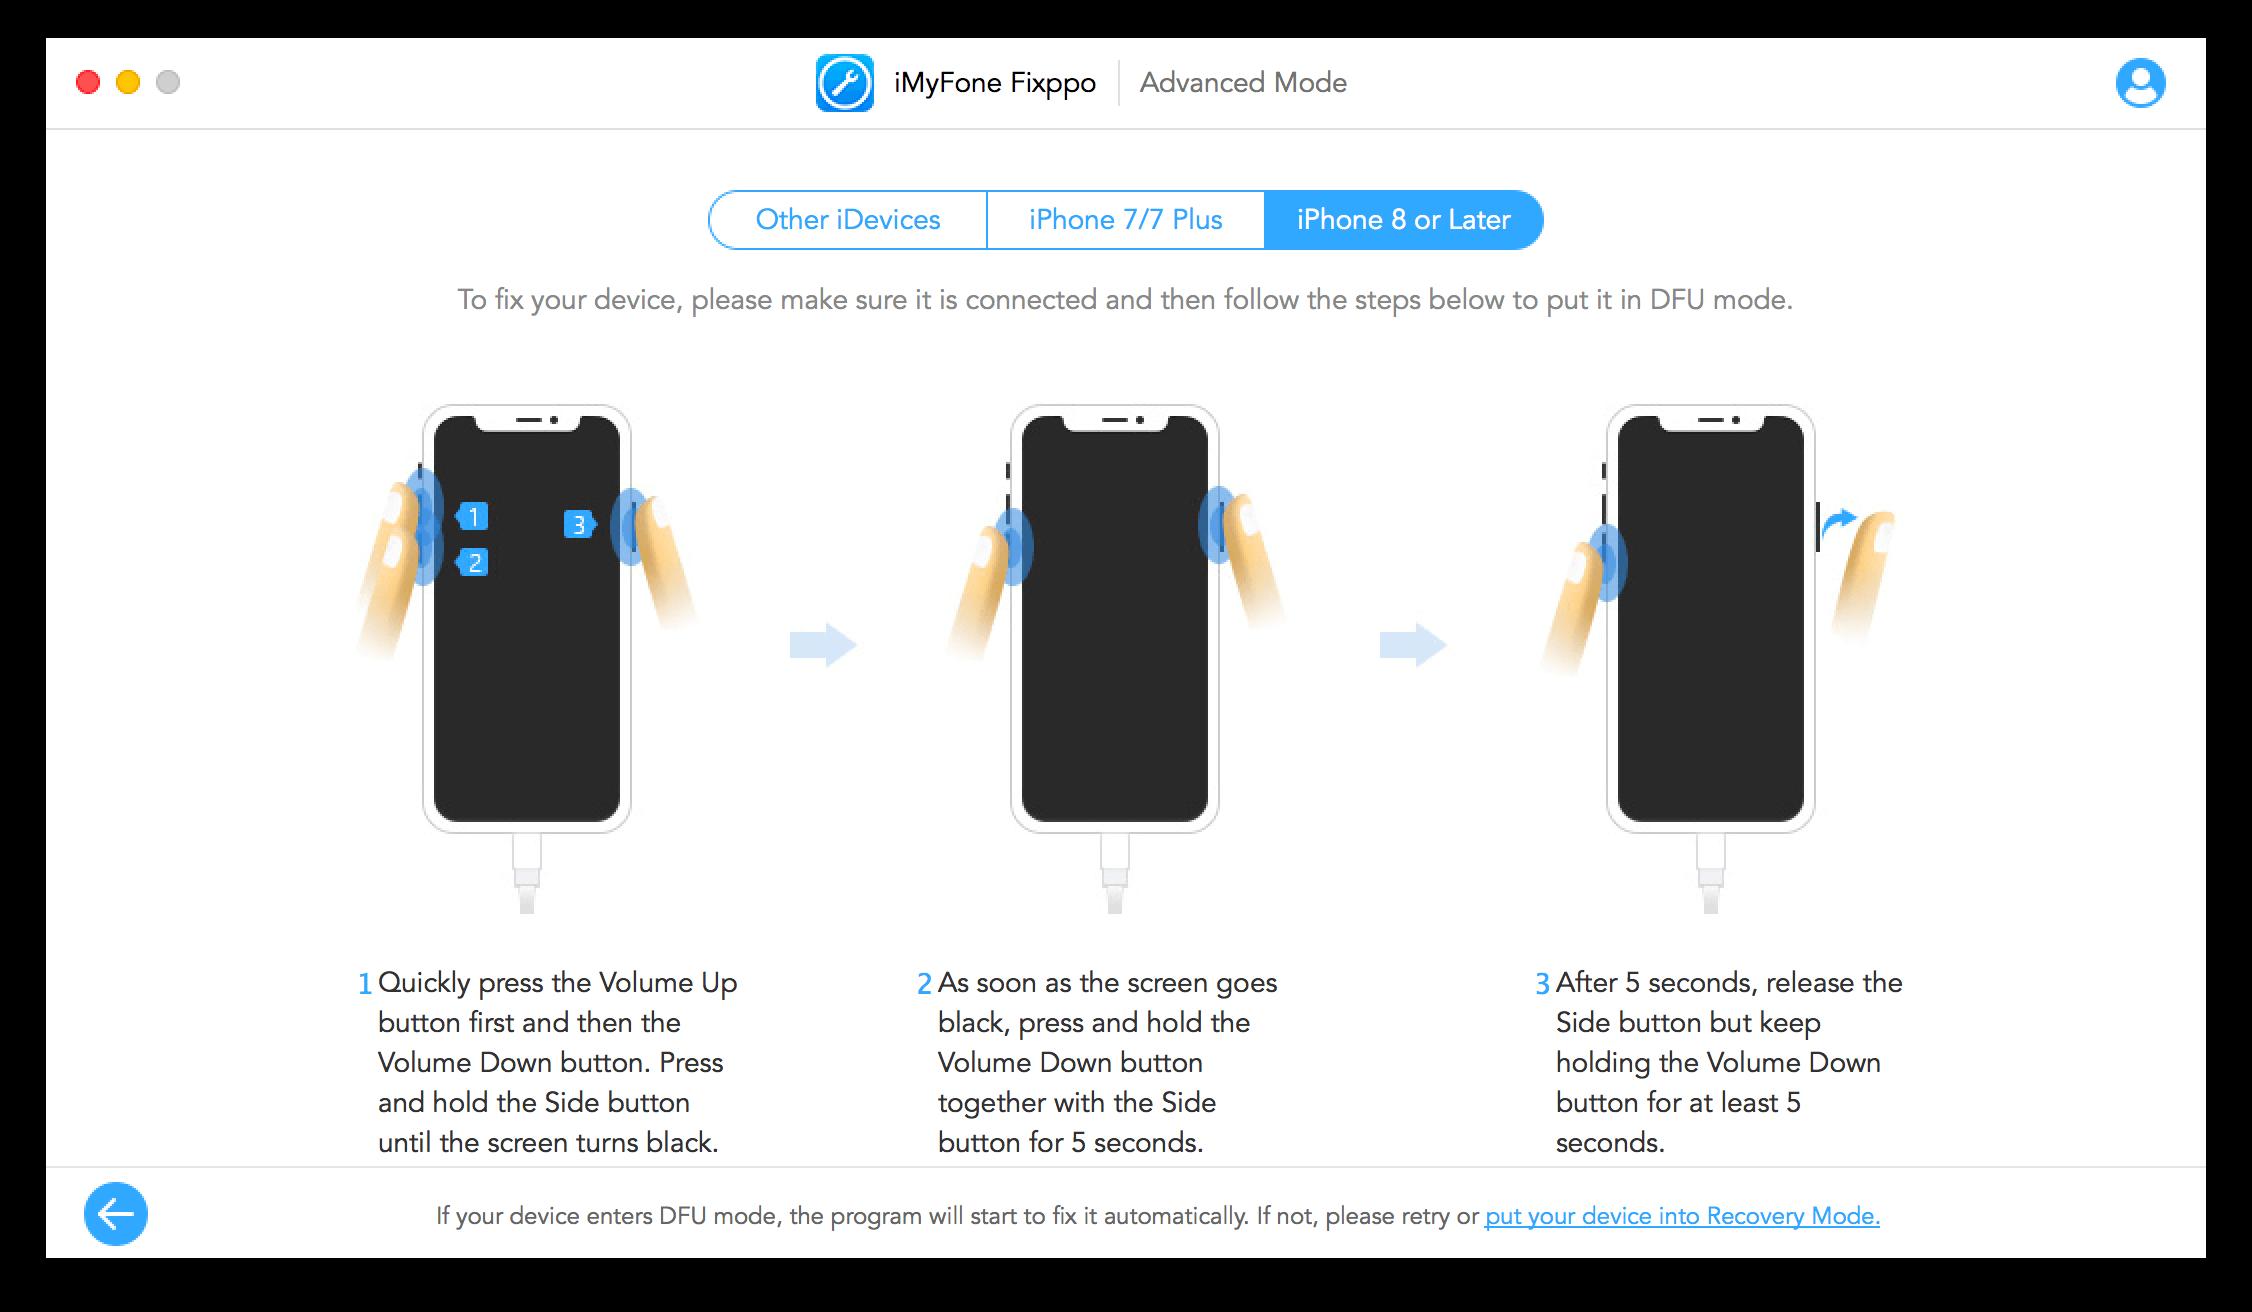 iMyFone Fixppo 修復iOS教學11